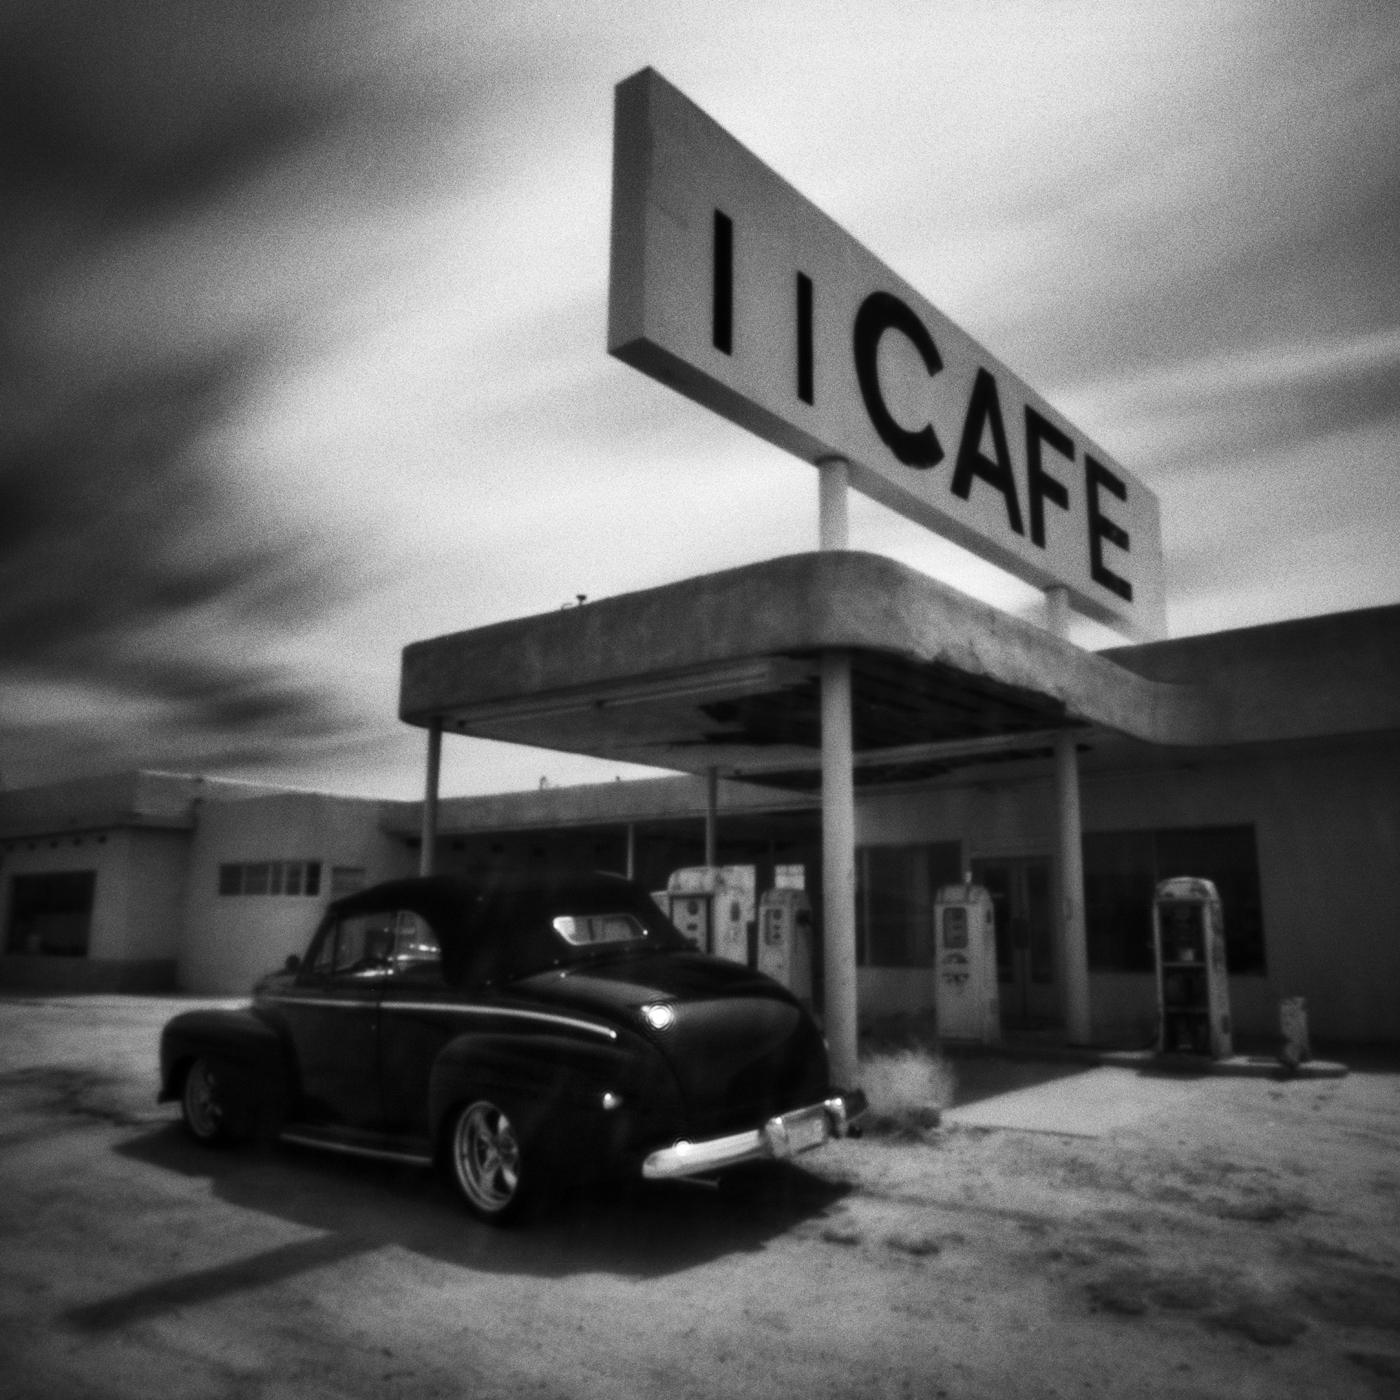 Desert Center Car- Pinhole